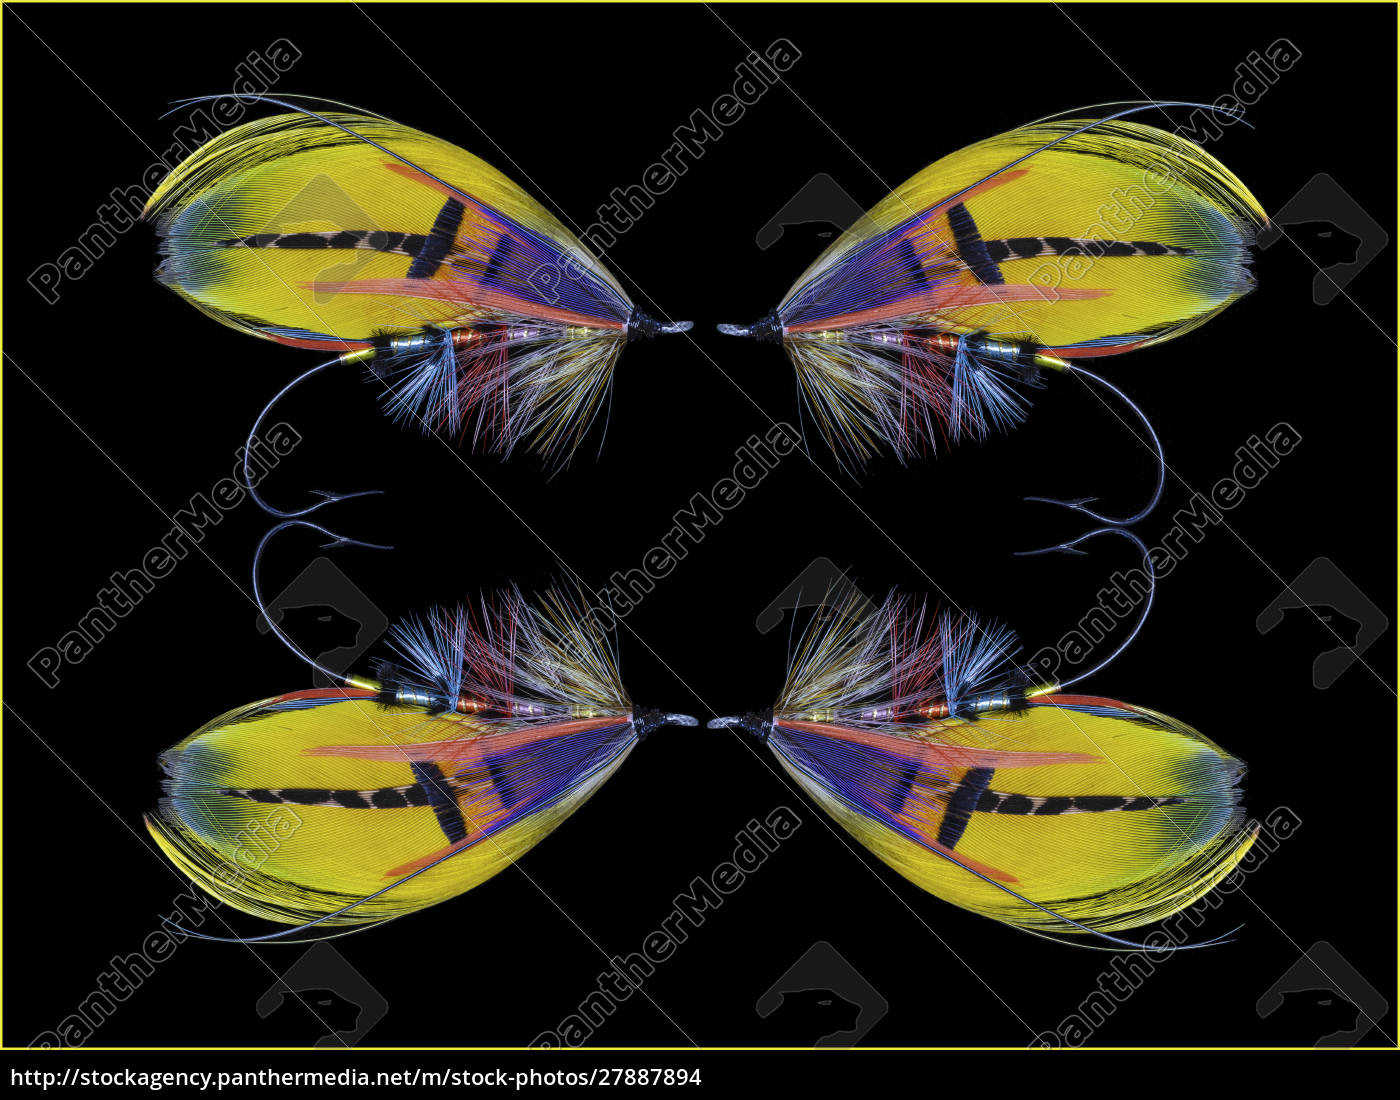 atlantic, salmon, fly, designs, 'shannon' - 27887894